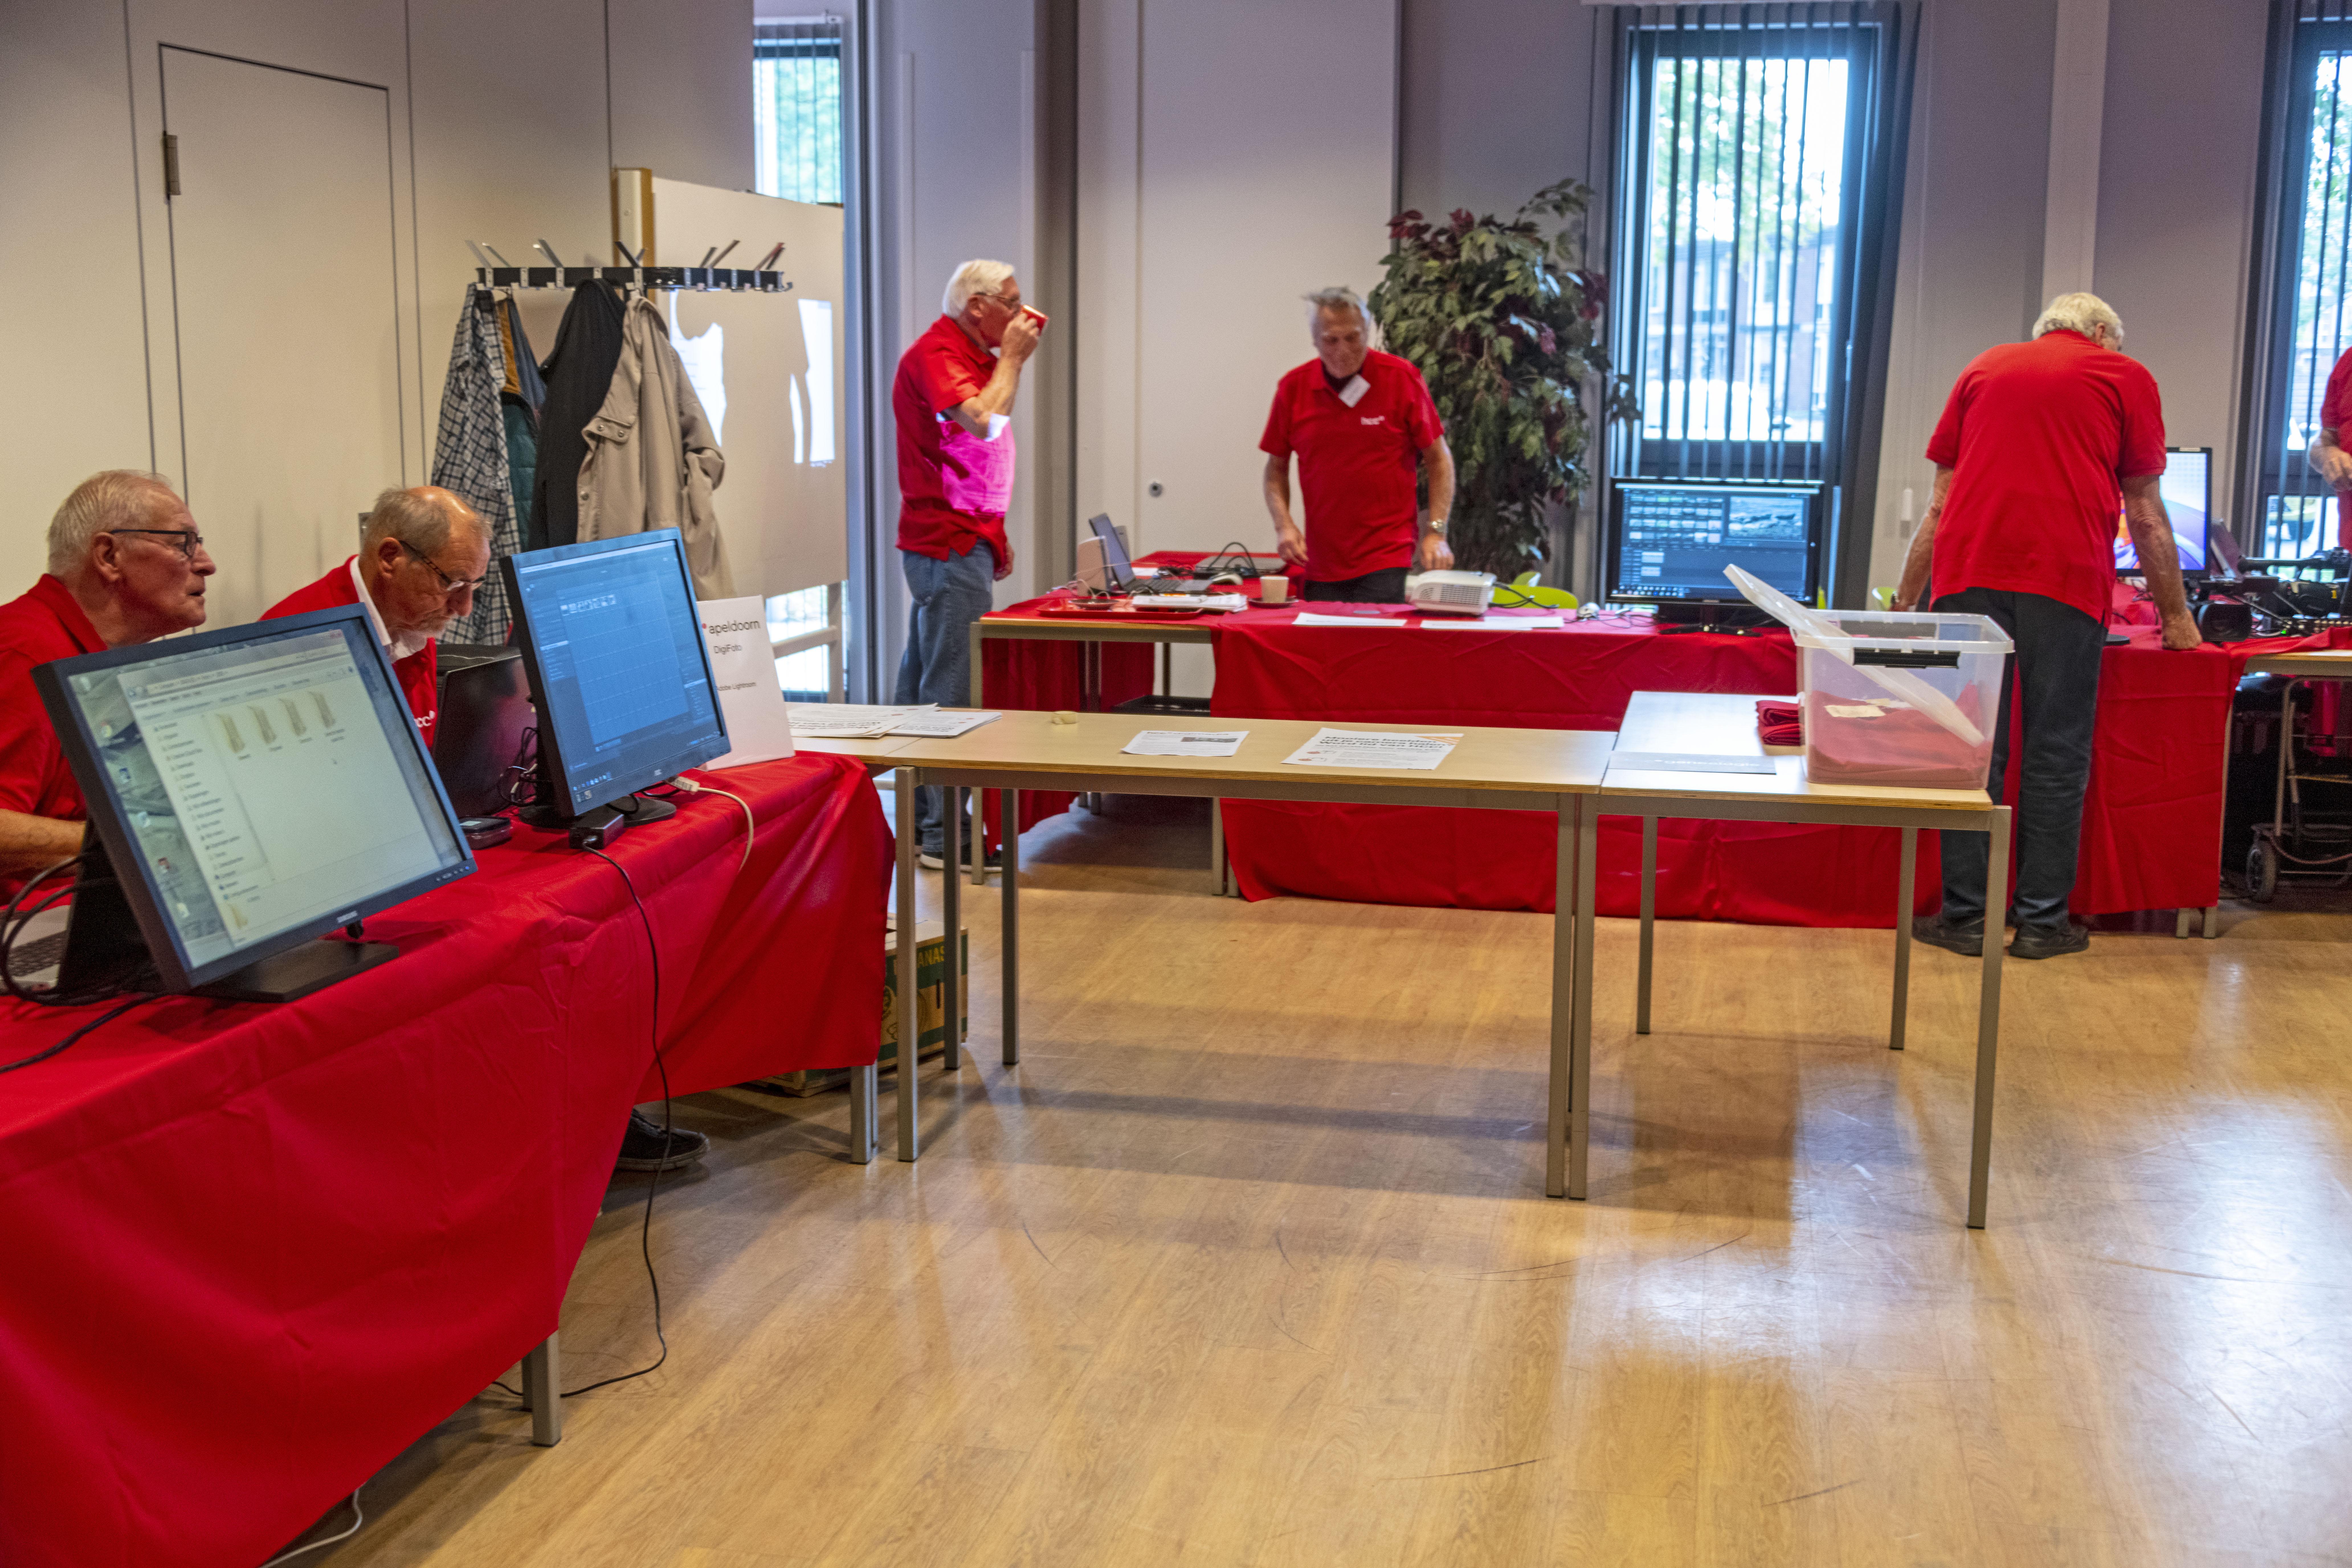 2018-10-20-FB - 07 - HCC!Digimedia - HCC!fotovideo event - dok Zuid - Apeldoorn